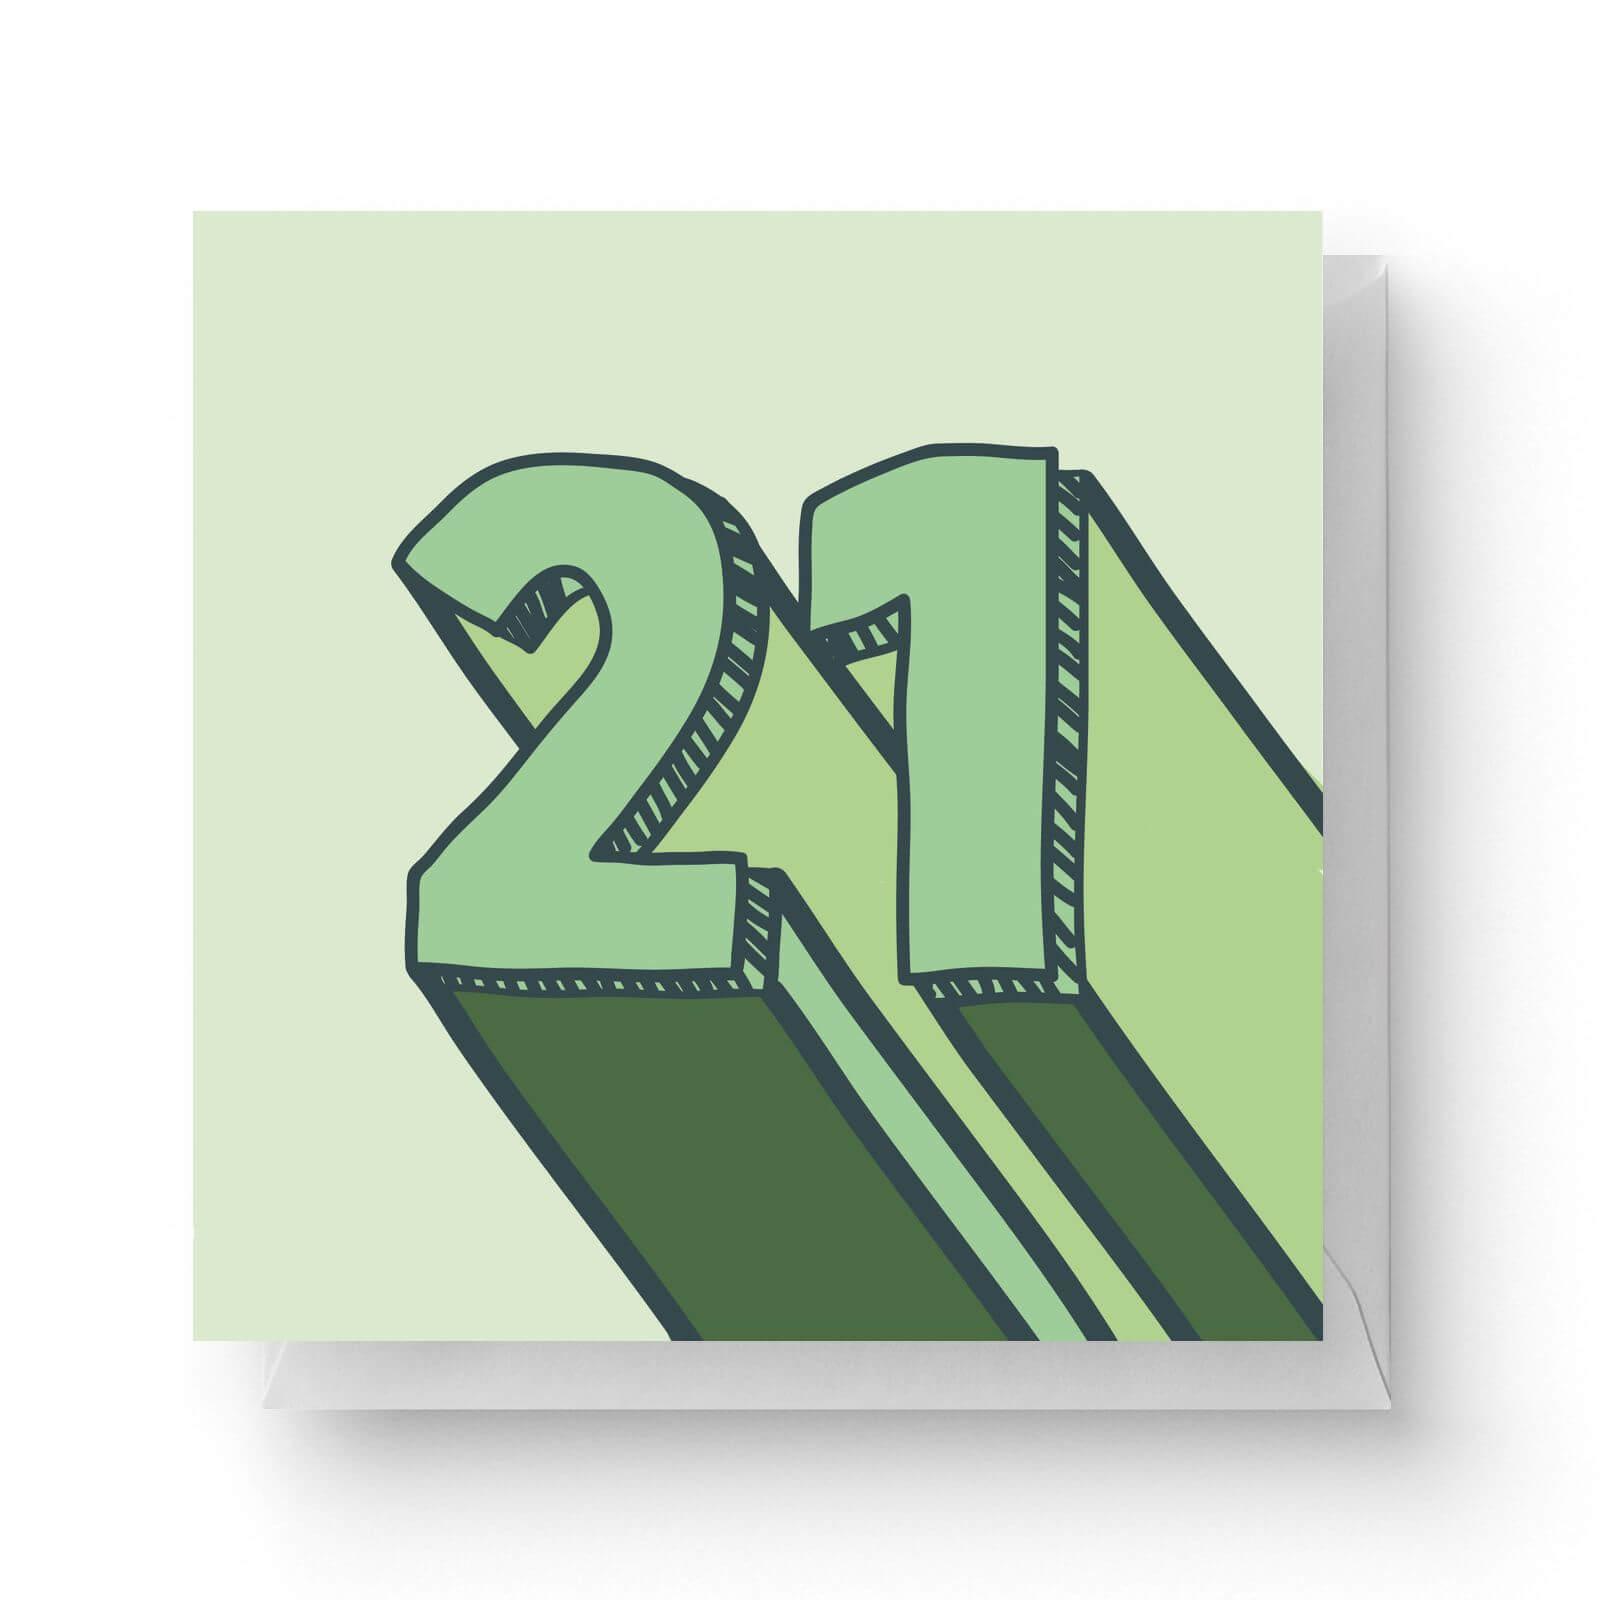 Image of 21 Square Greetings Card (14.8cm x 14.8cm)